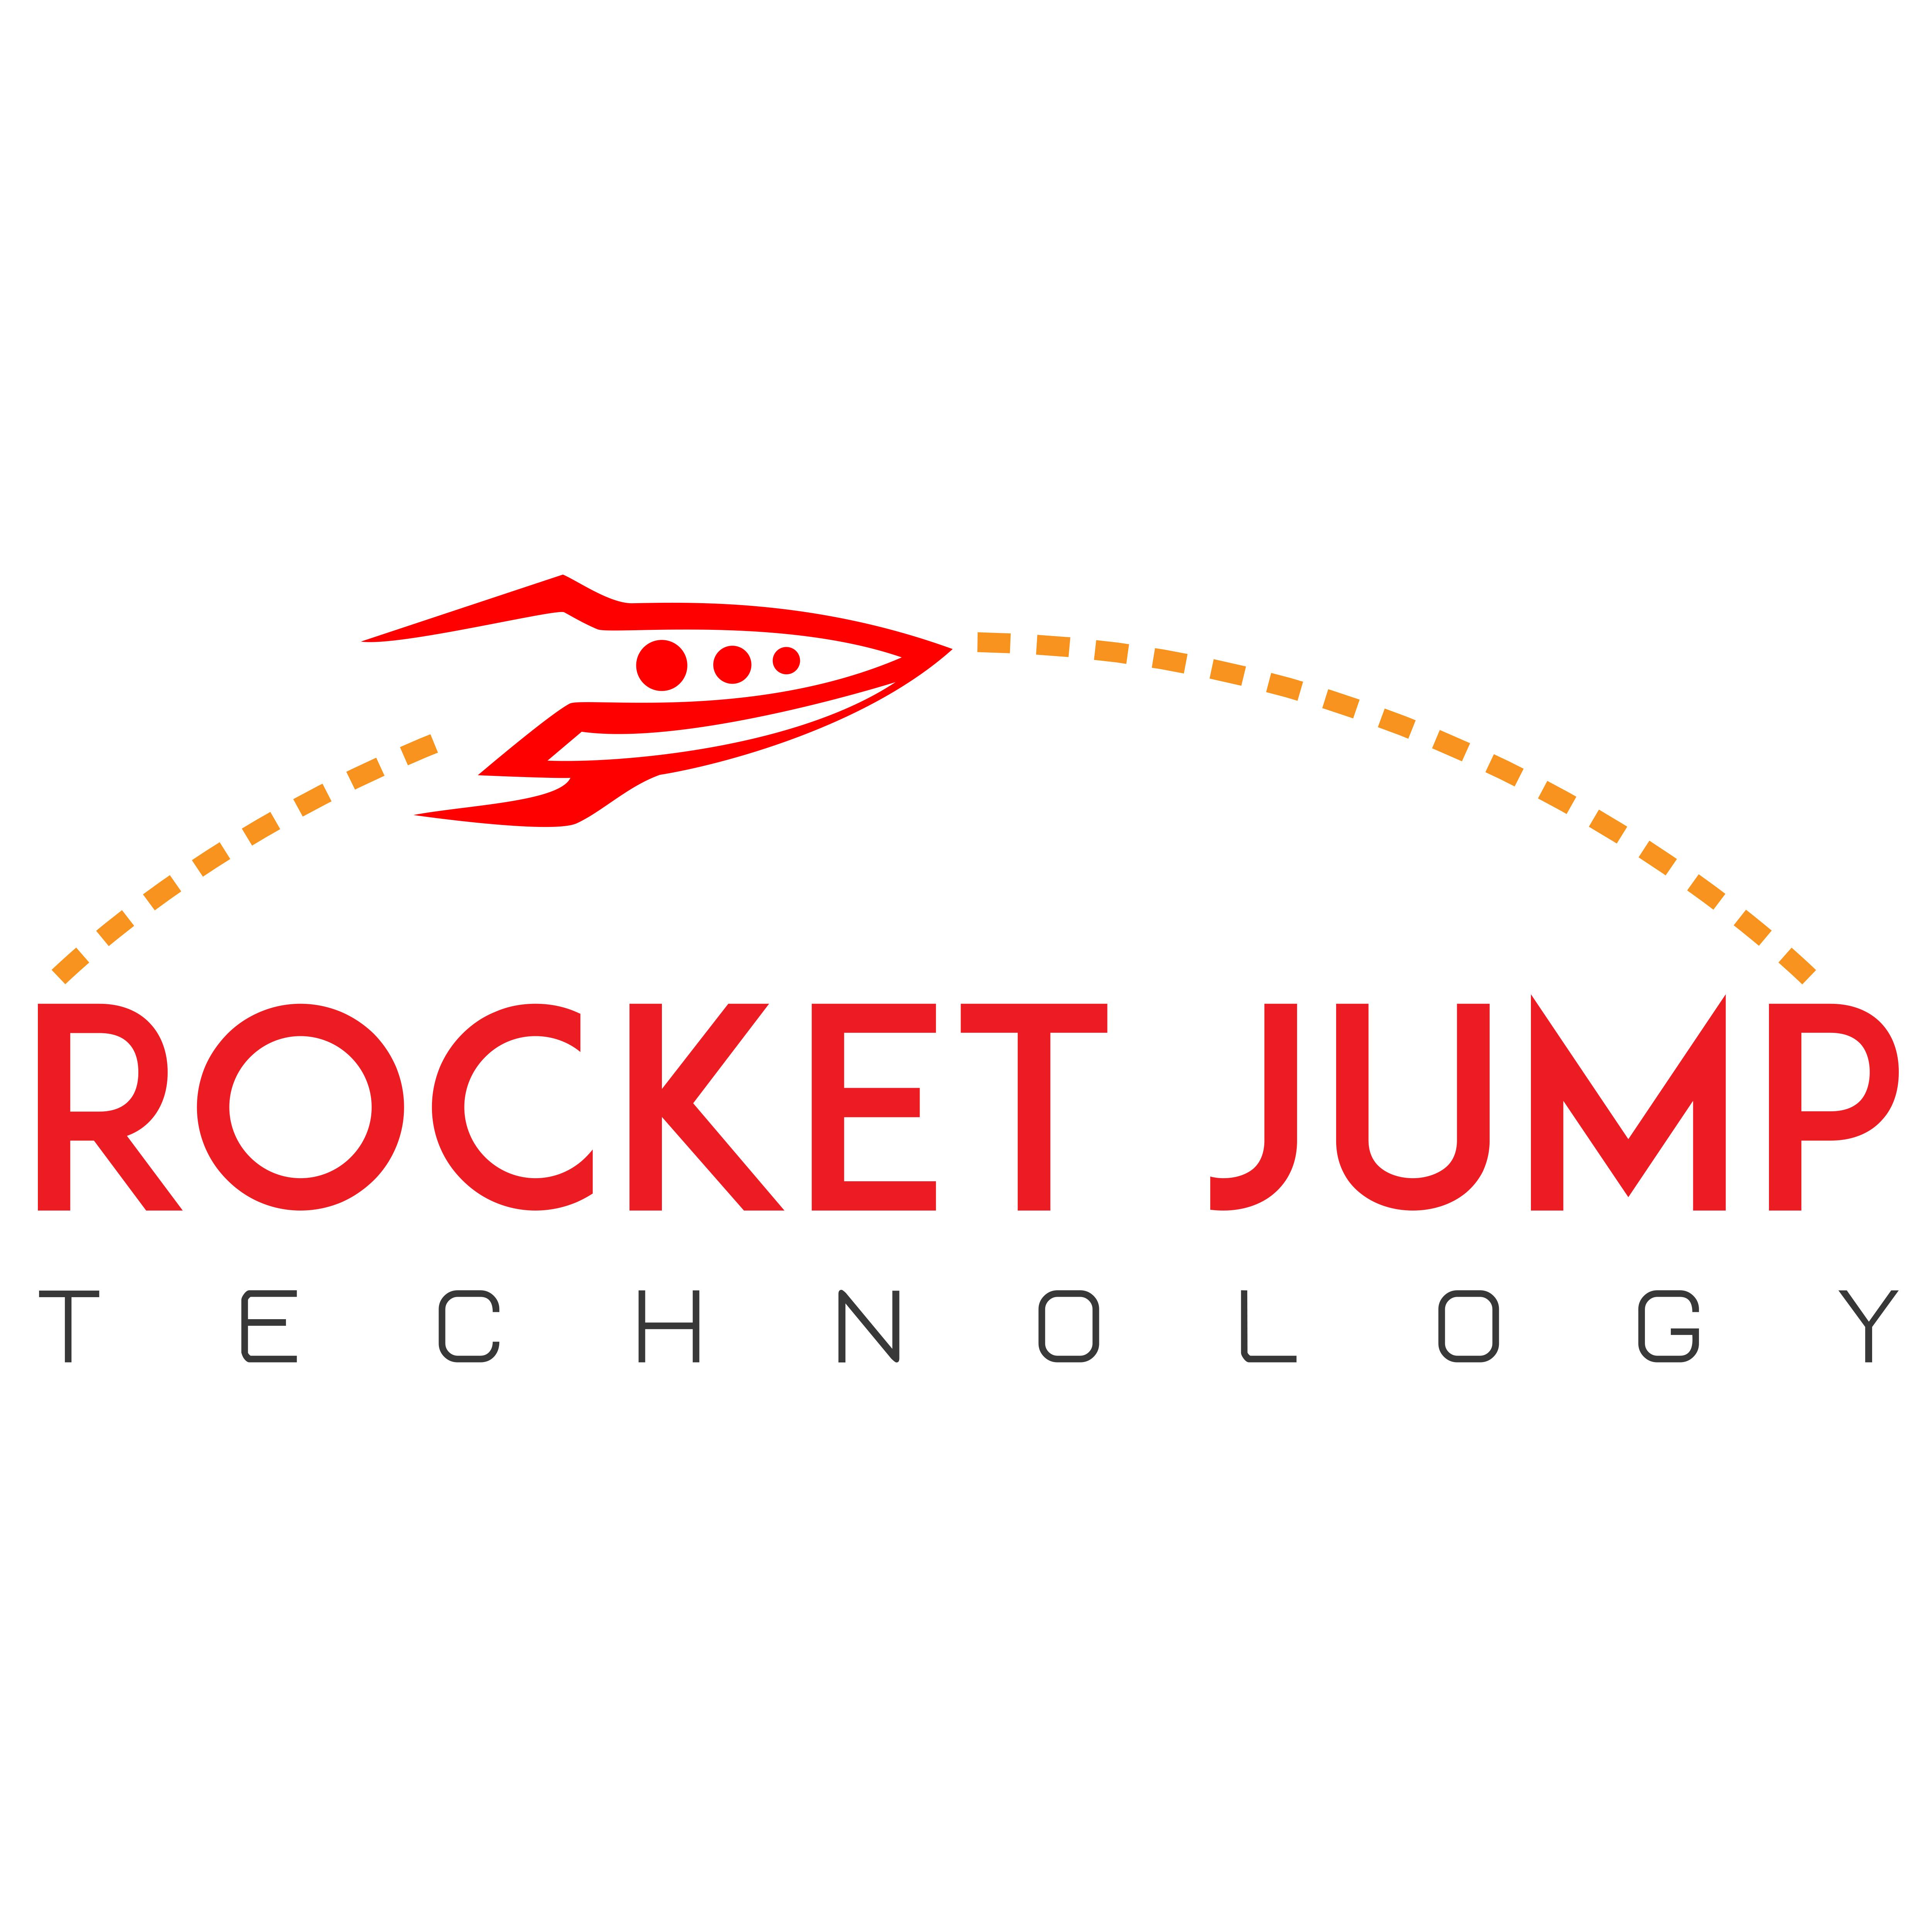 Rocket Jump Technology